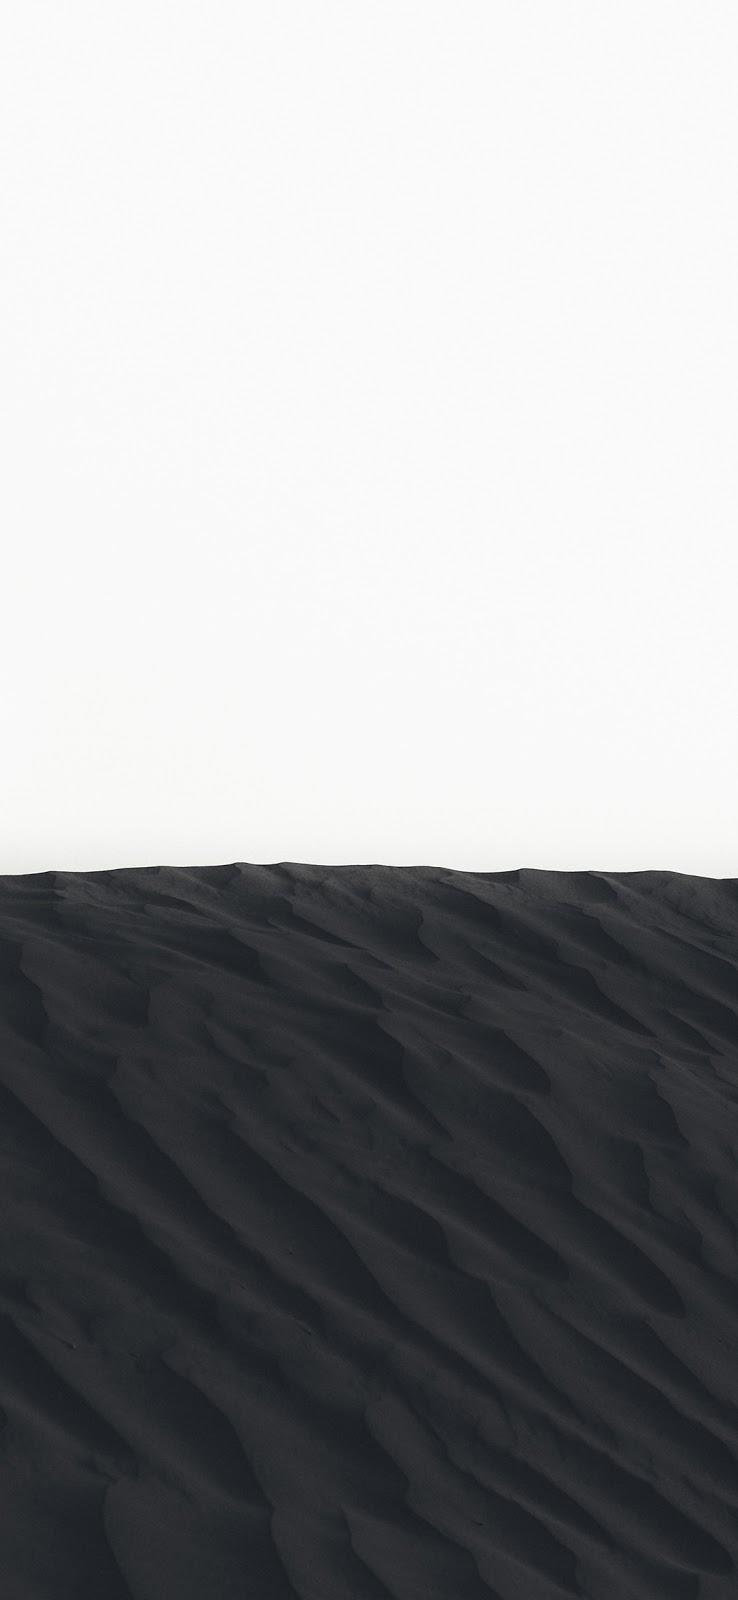 Cool black sand dunes